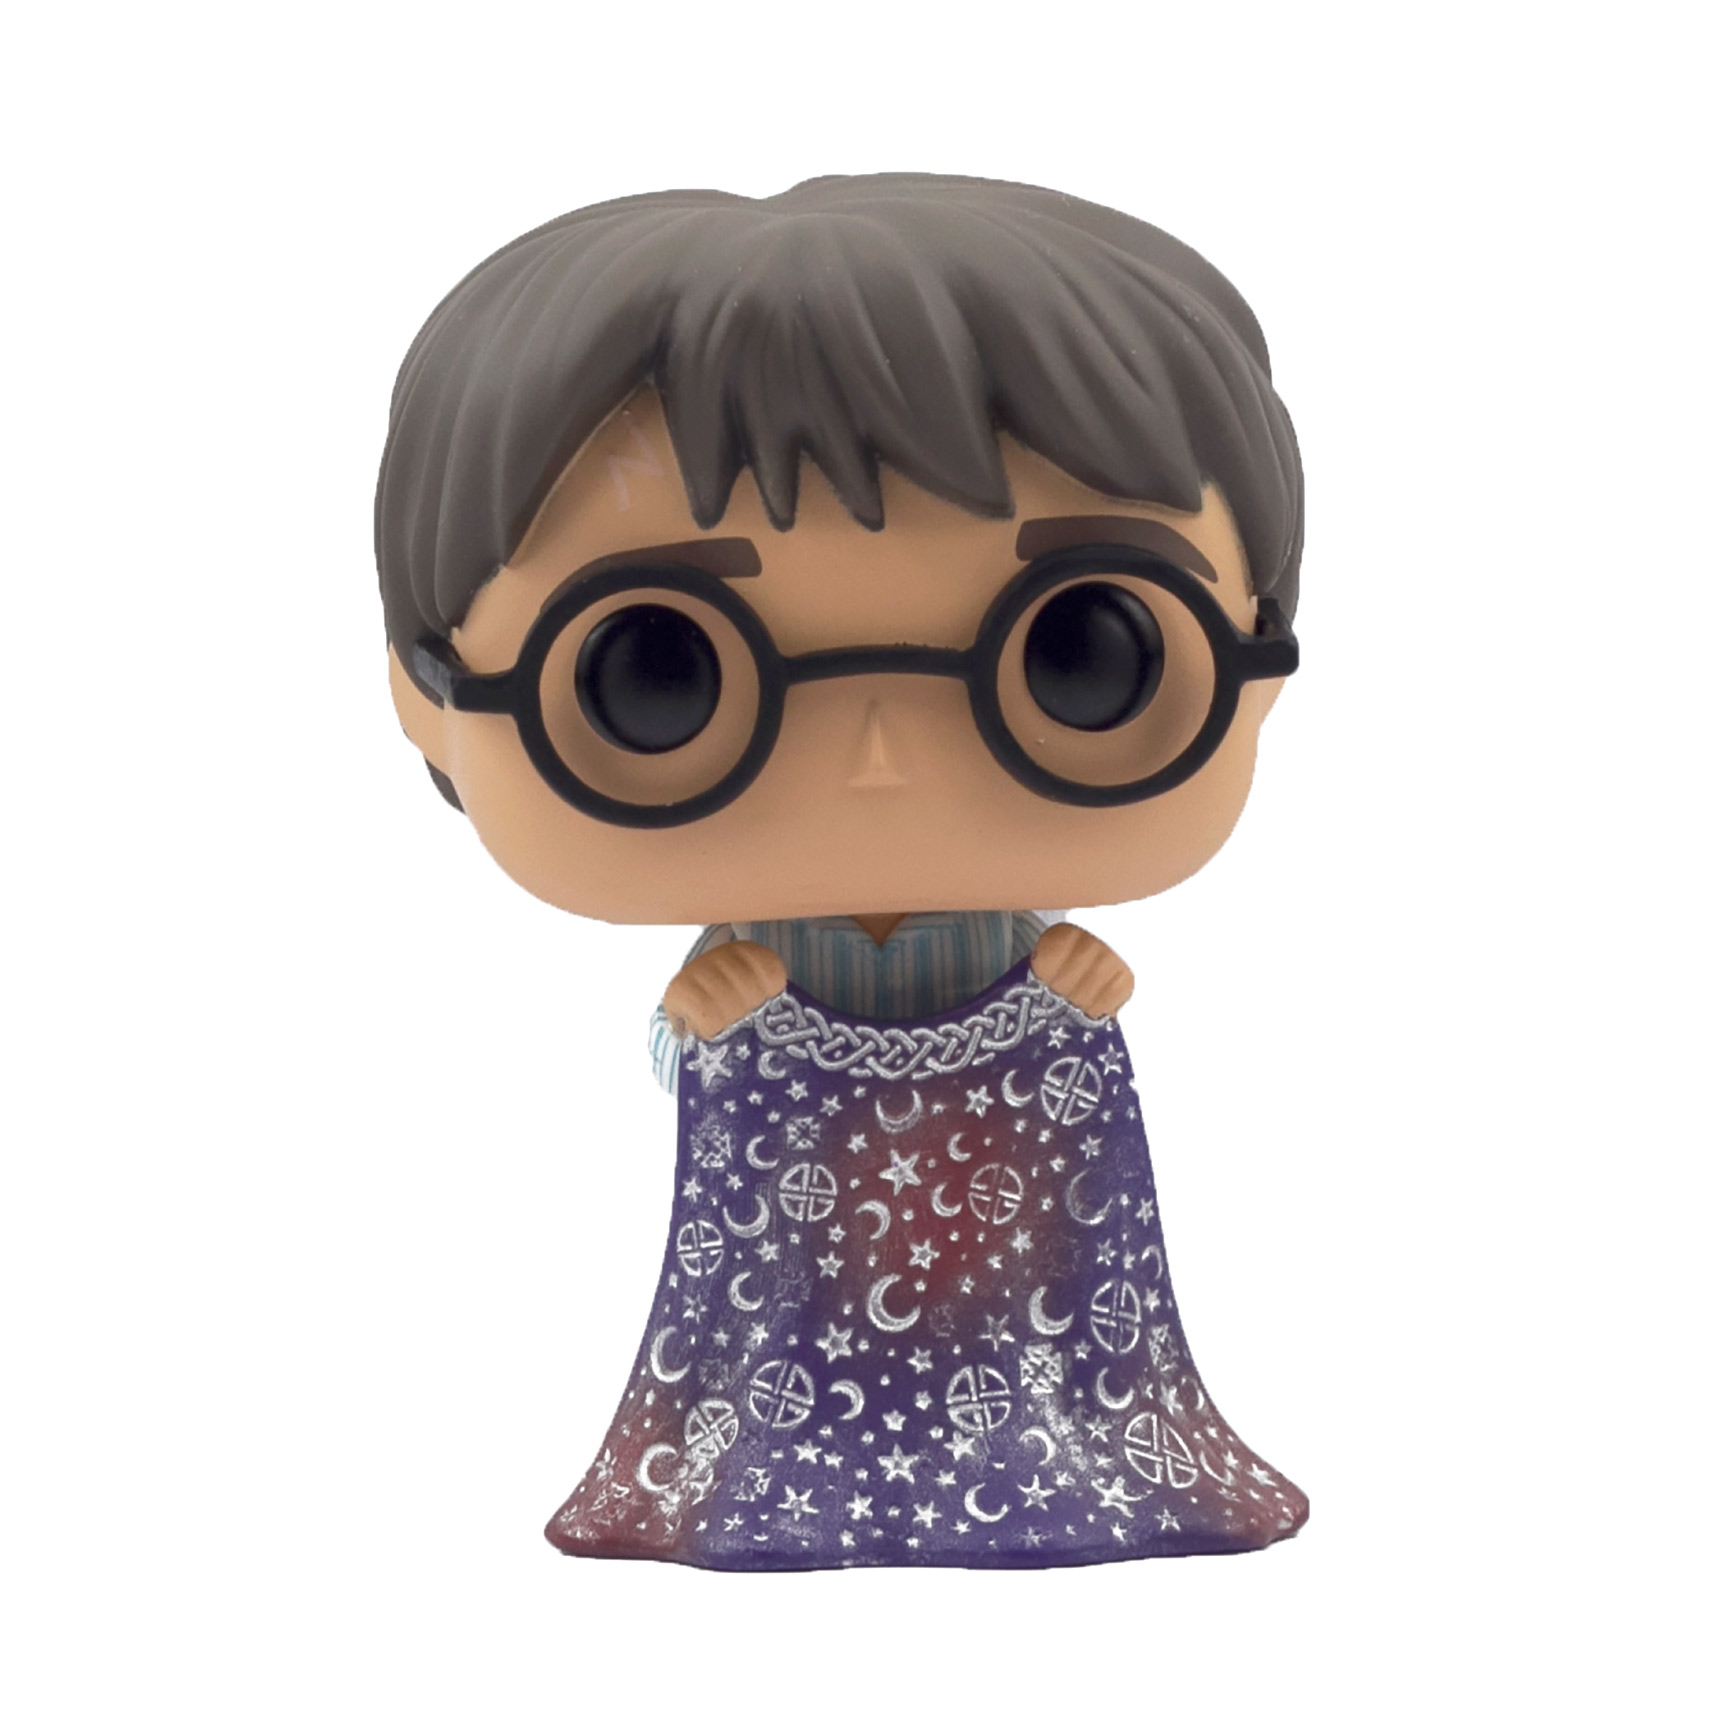 Фигурка Funko POP! Vinyl 16х12х9 см: Harry Potter: Harry w/Invisibility Cloak funko фигурка funko pop vinyl охотники за привидениями лизун с хот догами 39333